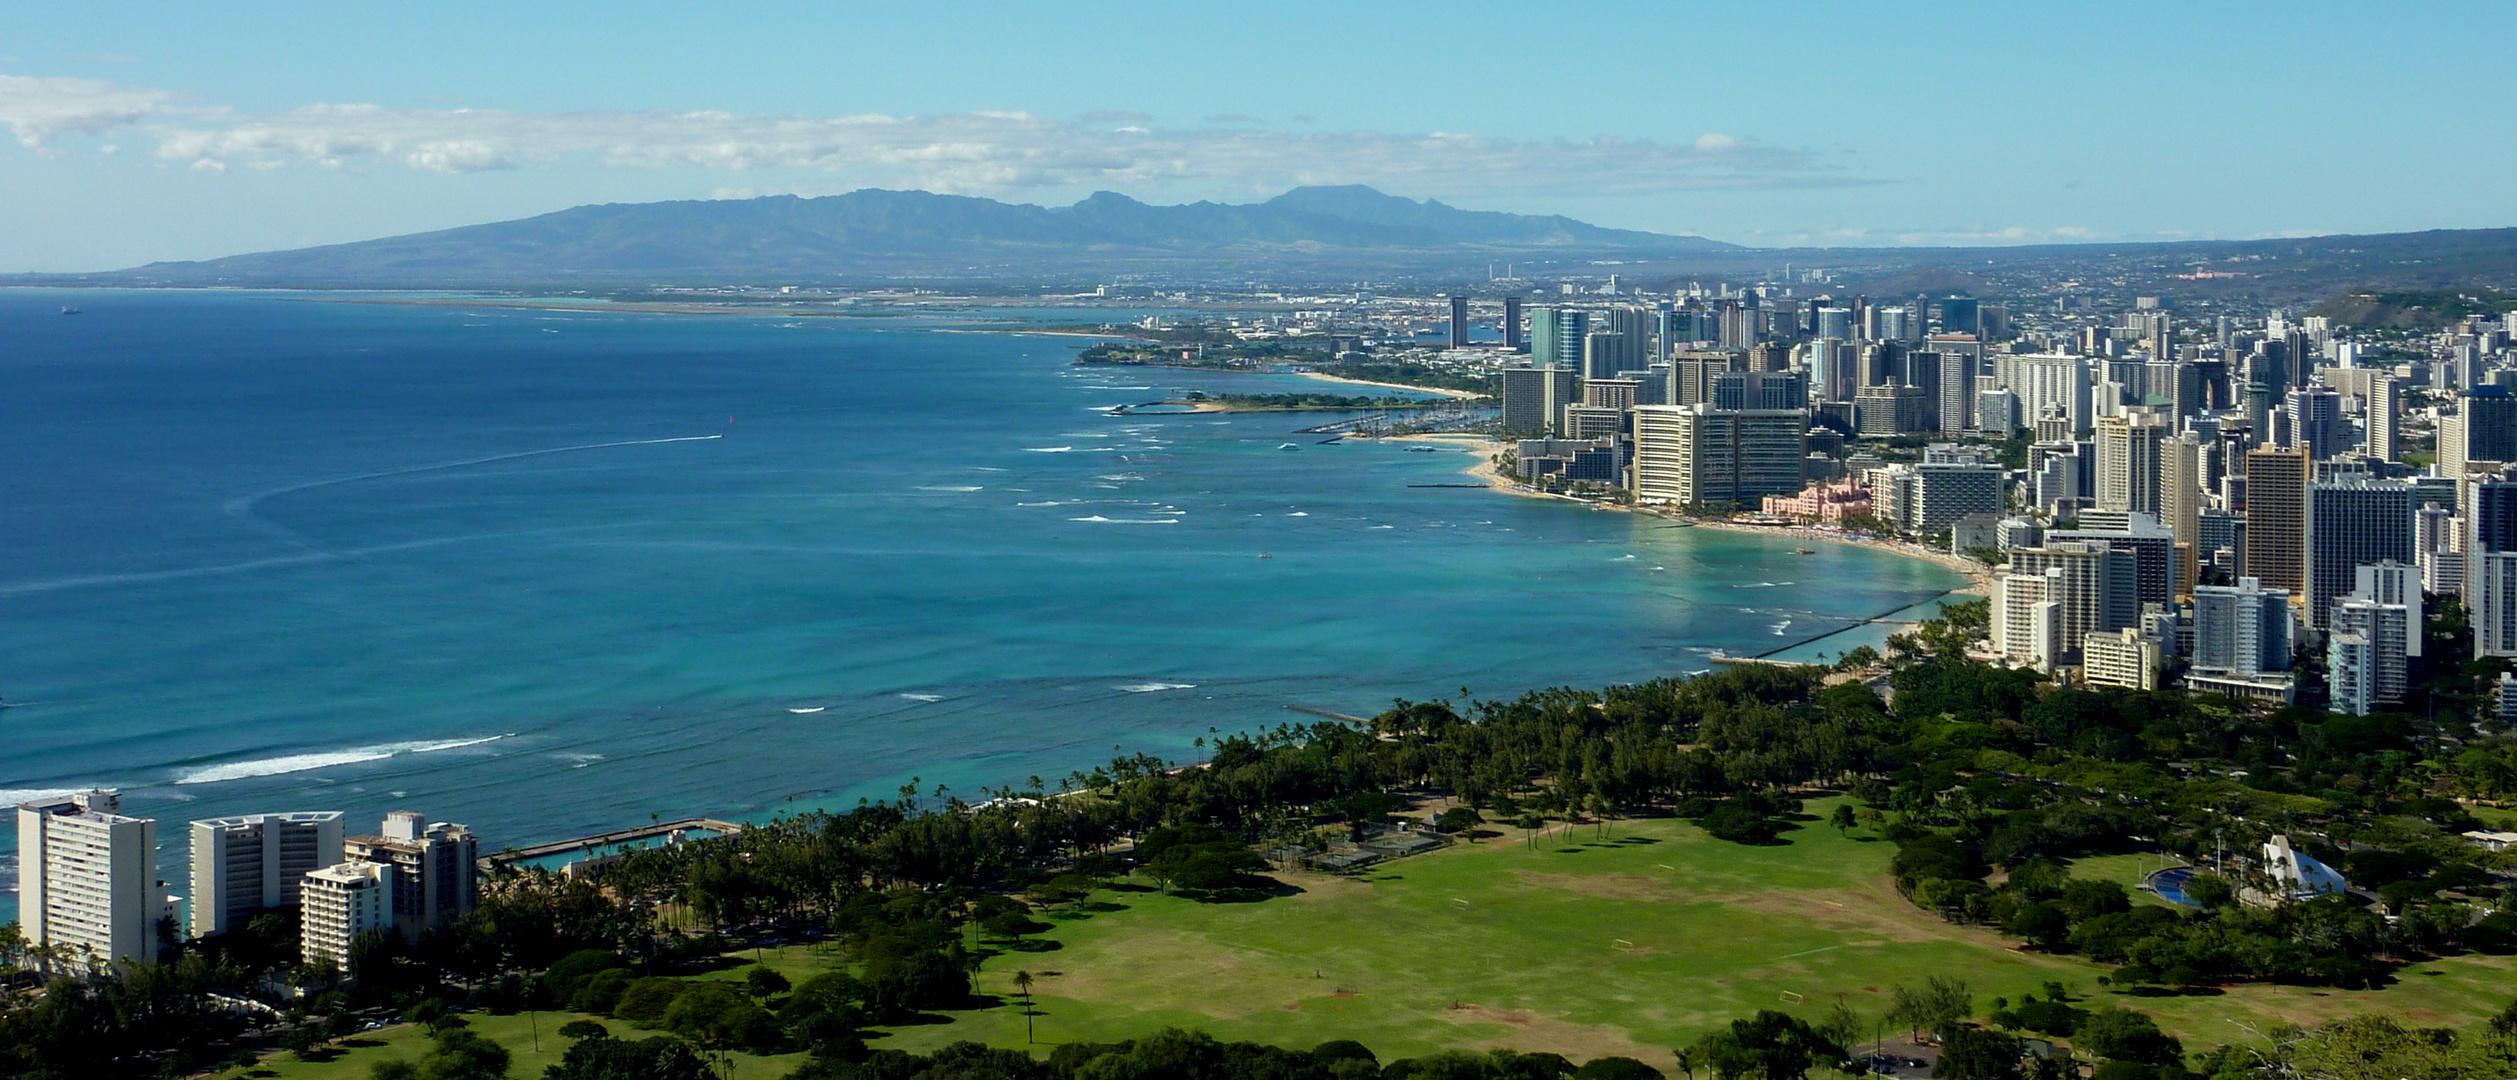 Waikiki Beach view from Diamond Head mountain.. Oahu Island, Hawai'i..